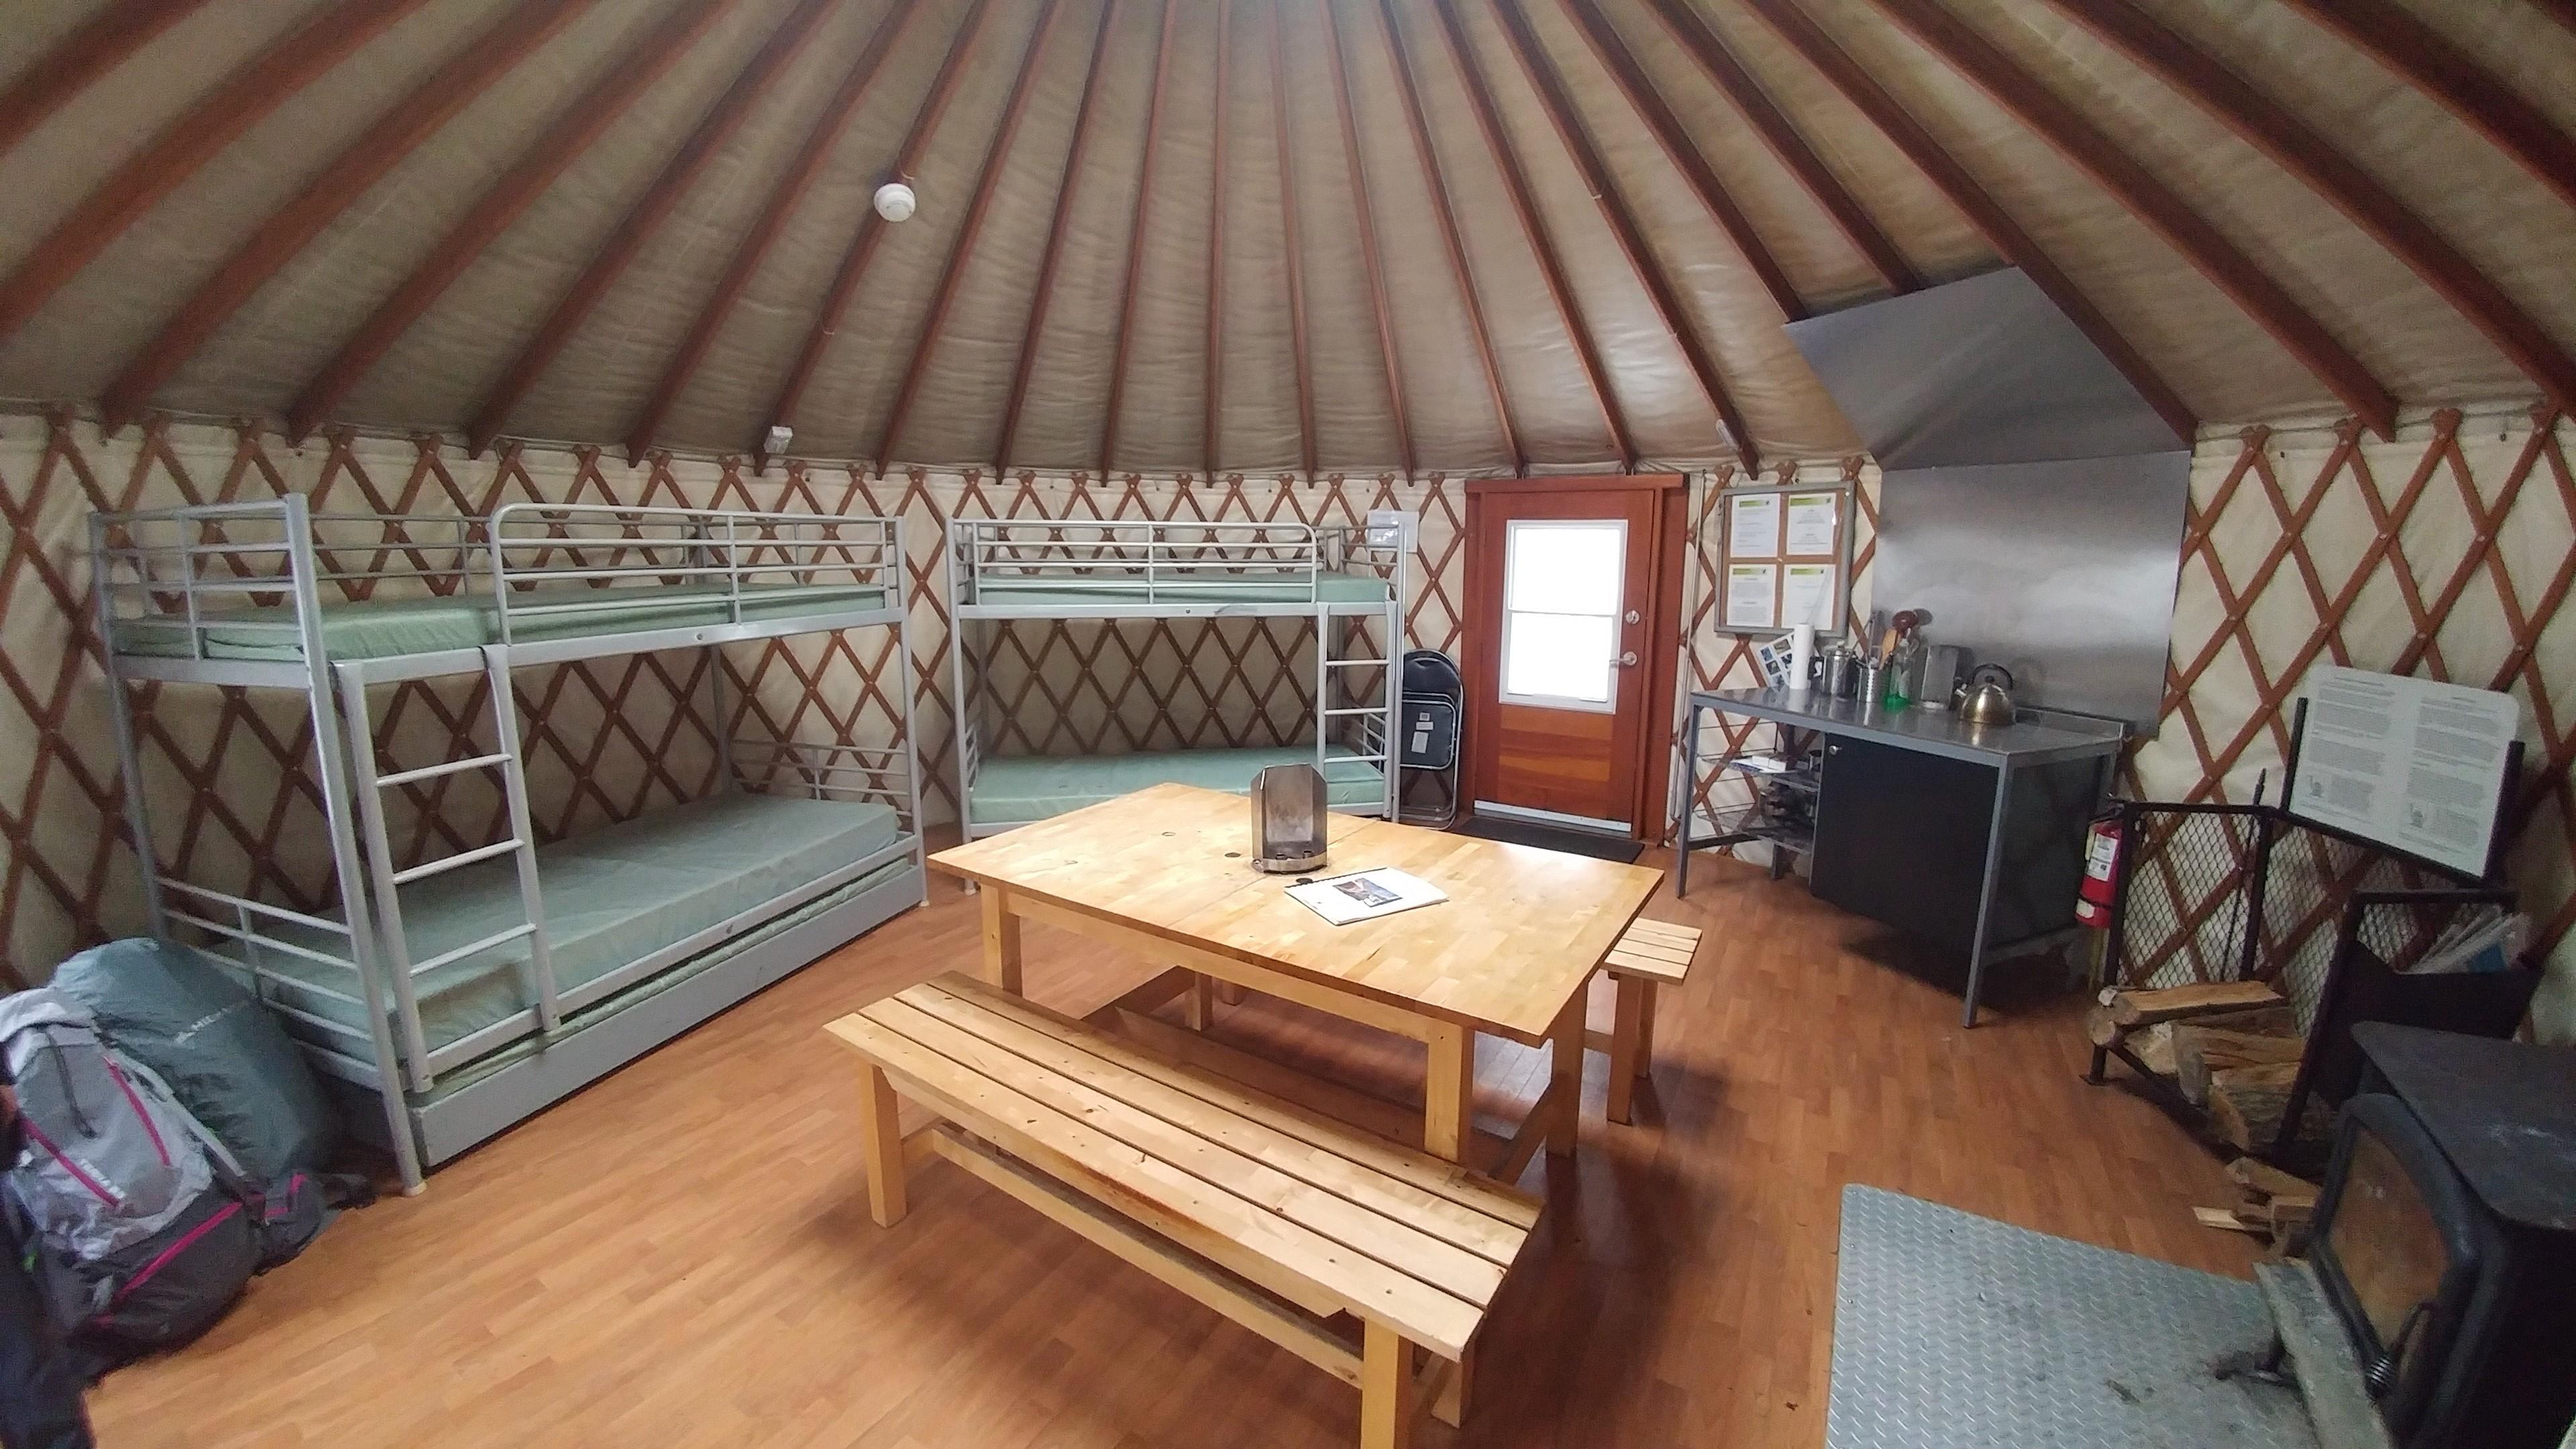 Yurt Camping For Beginners In Gatineau Park Yurting